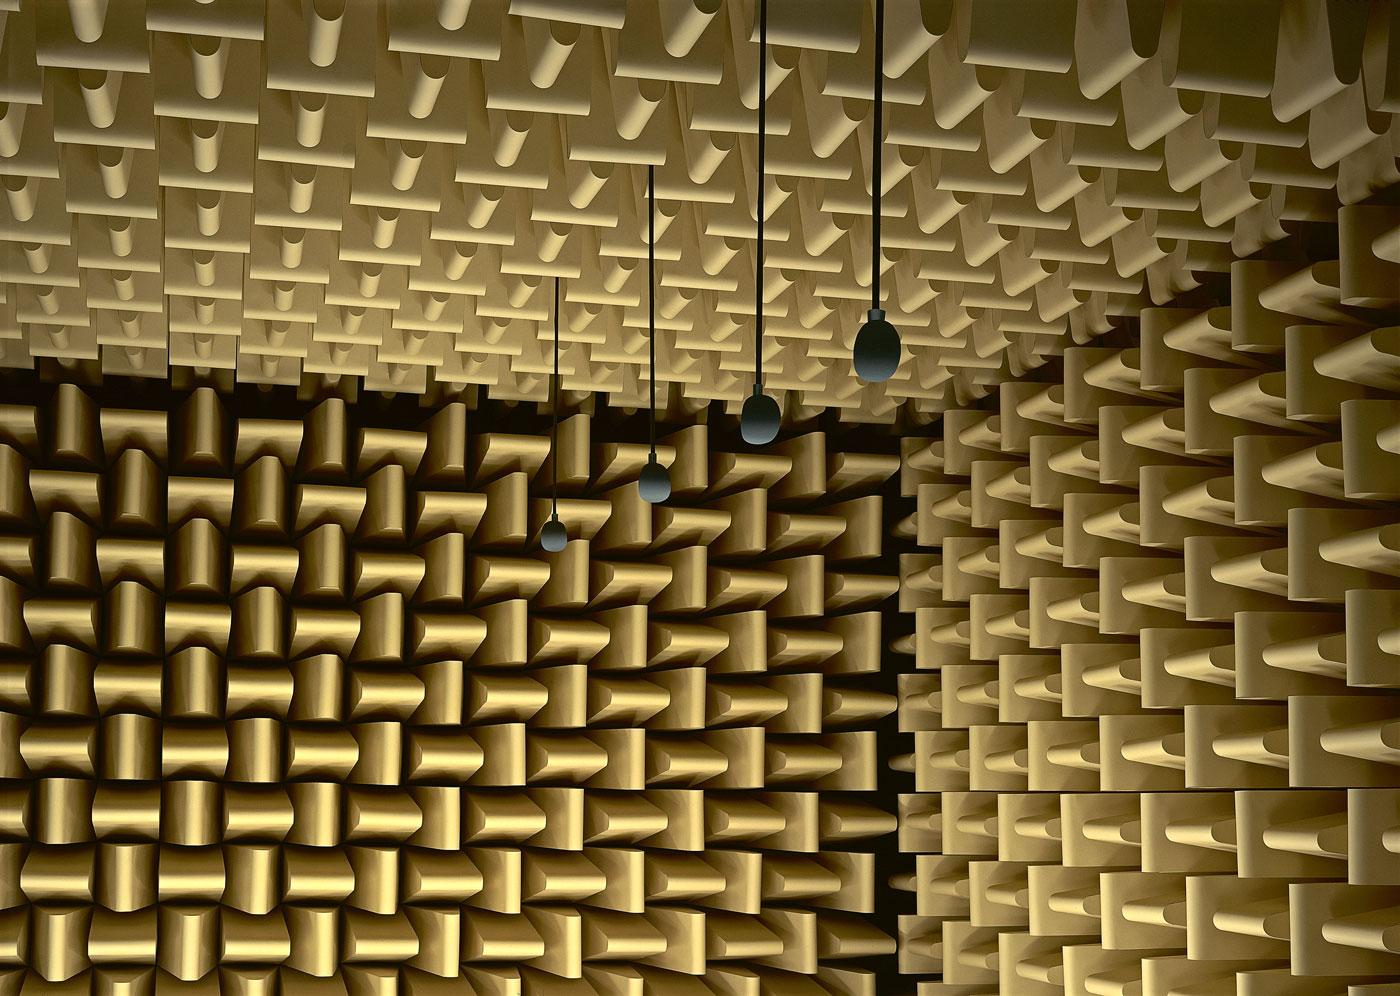 thomas demand german 1964 39 labor laboratory 39 2000. Black Bedroom Furniture Sets. Home Design Ideas